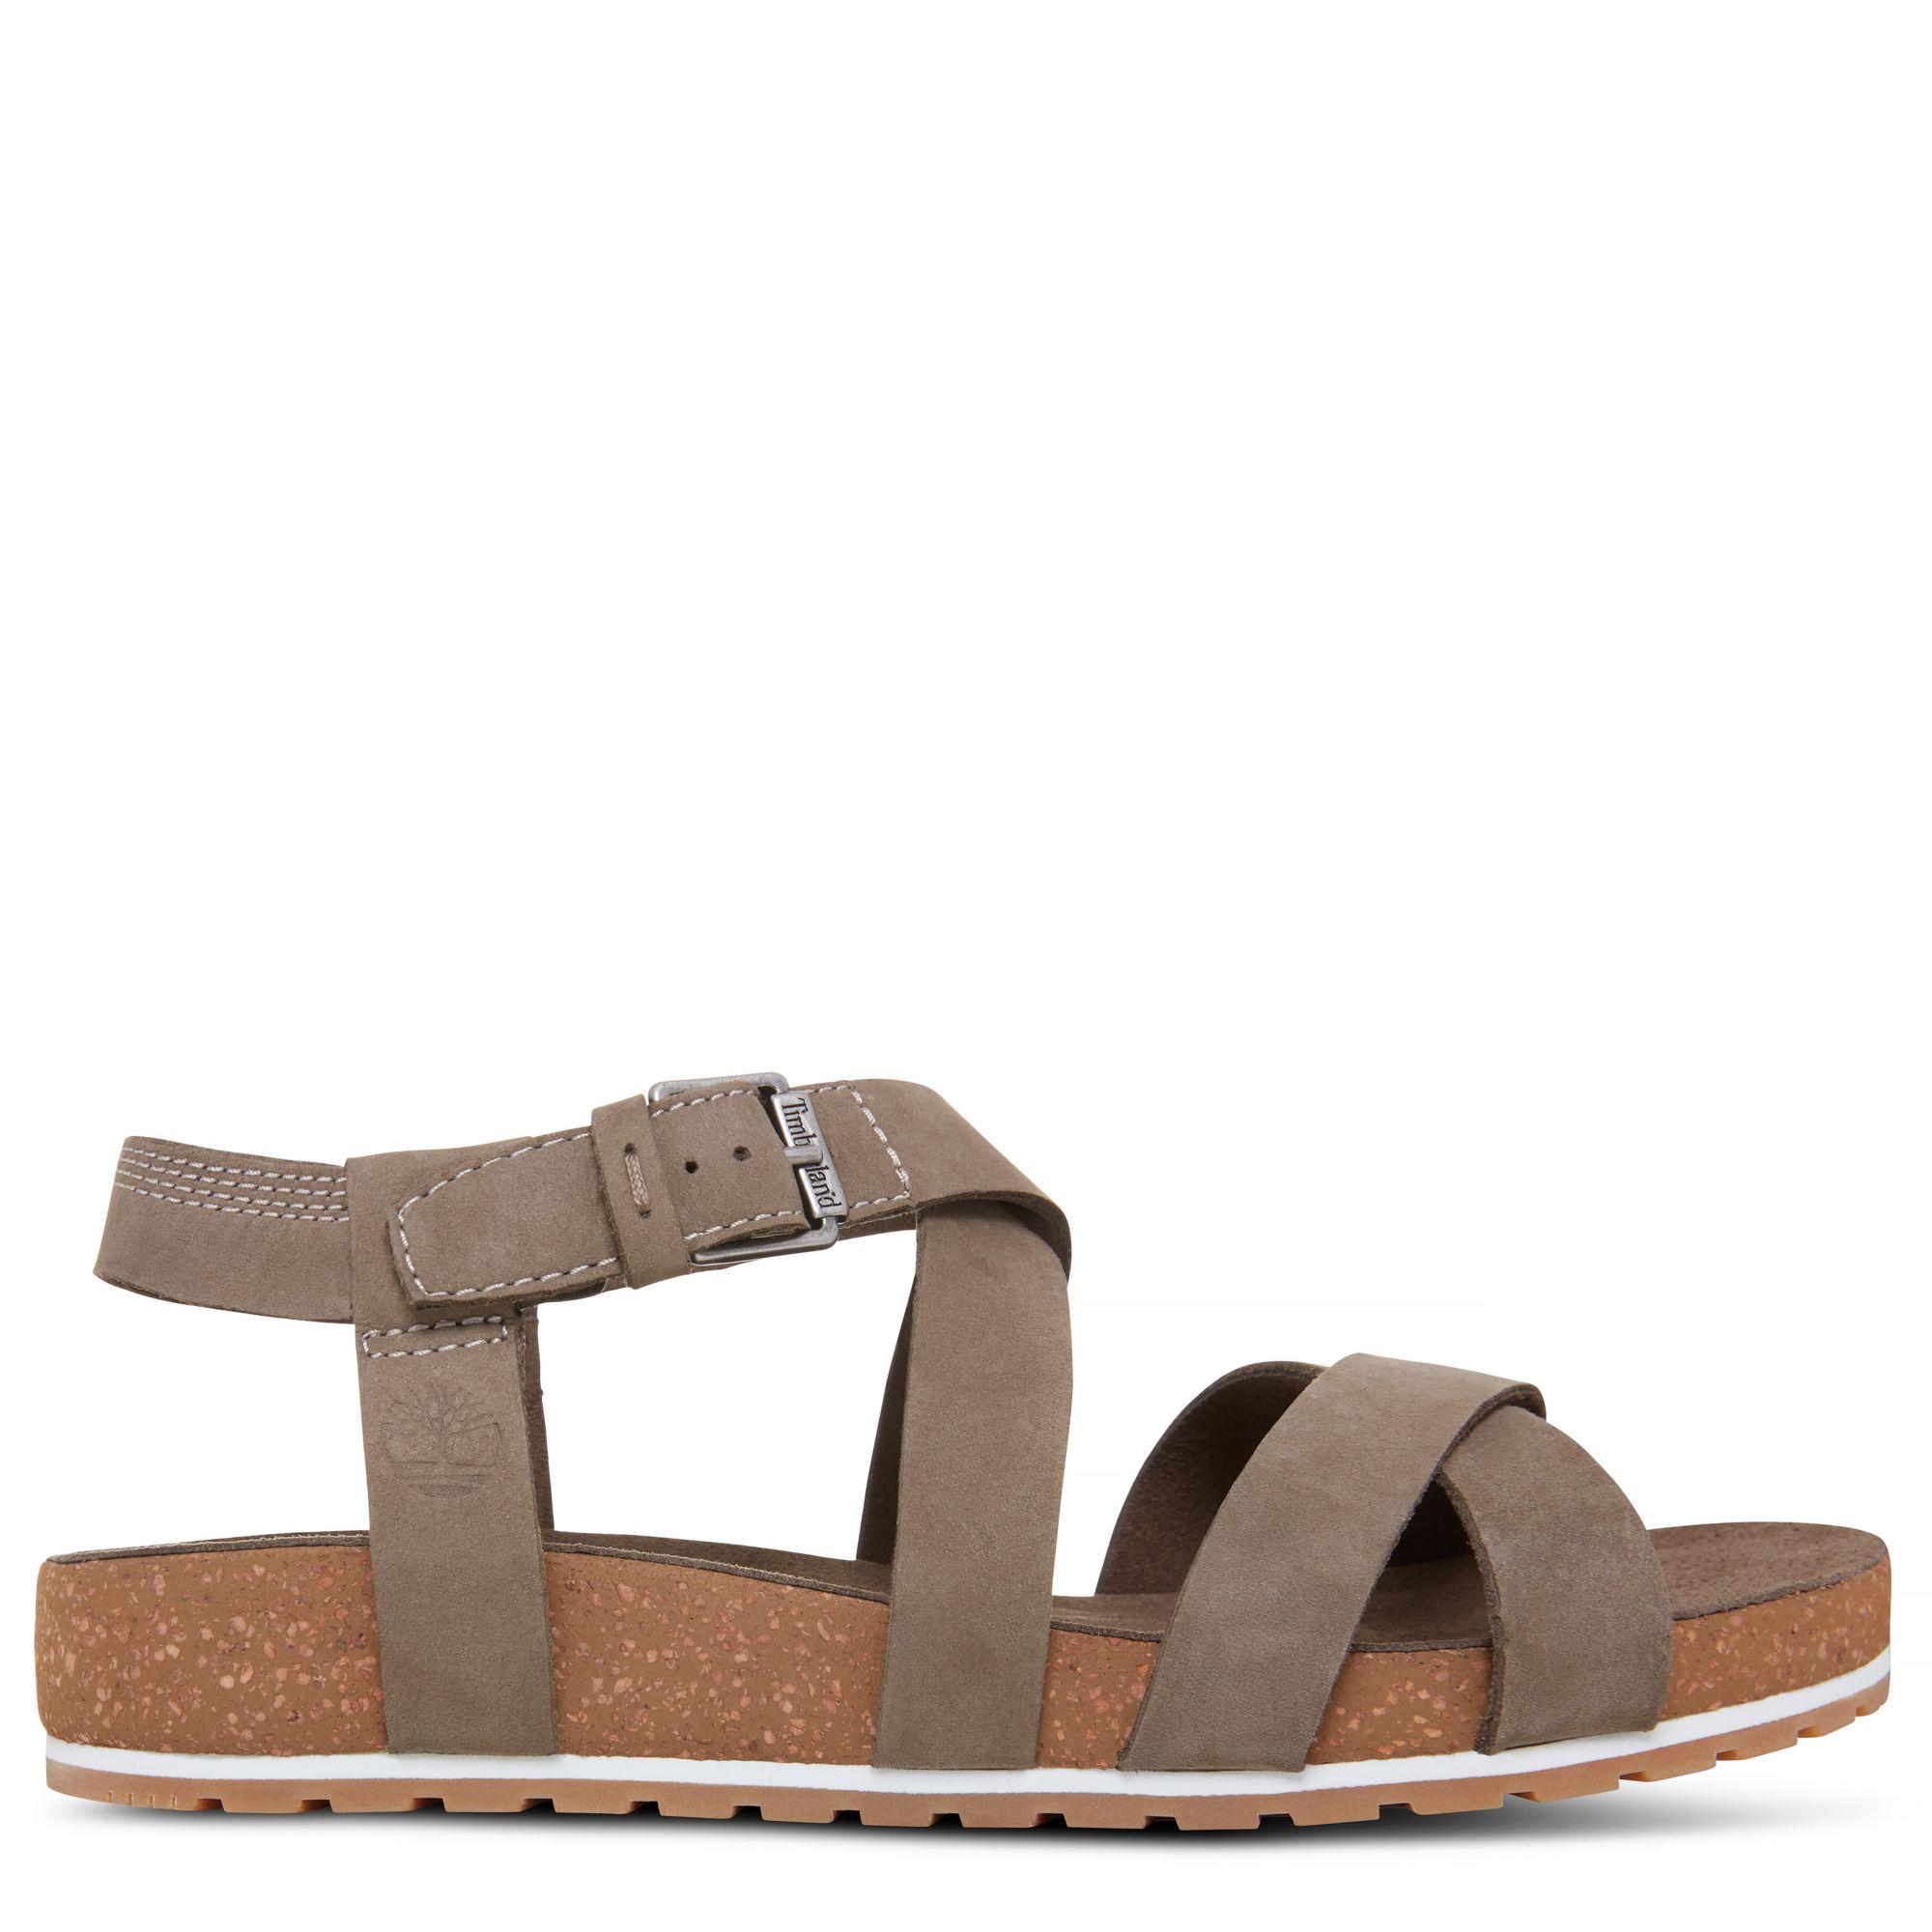 Timberland Women's Malibu Waves Ankle Strap Sandal Greige at